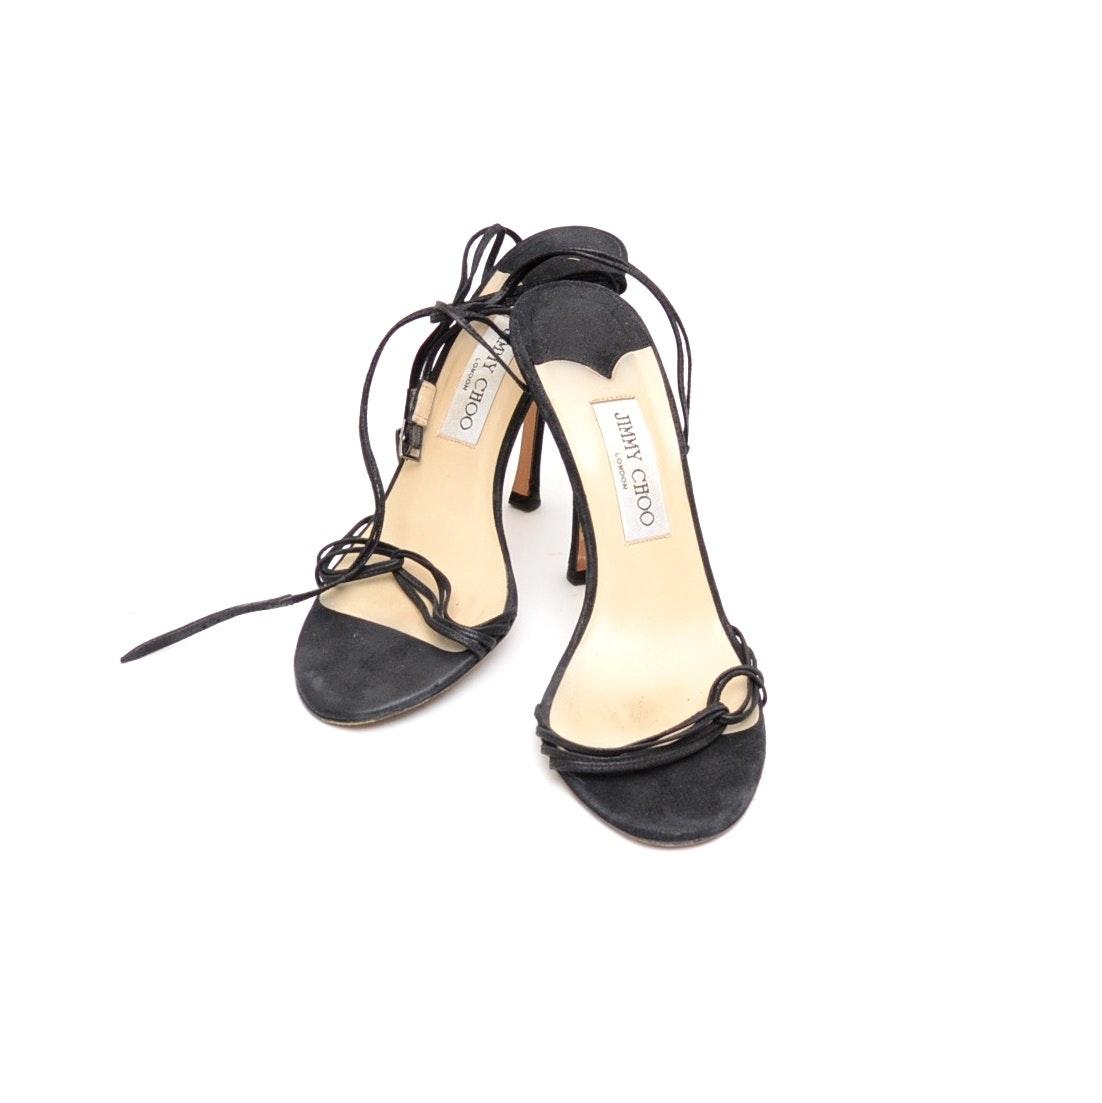 Jimmy Choo London Black Strappy Dress Sandals